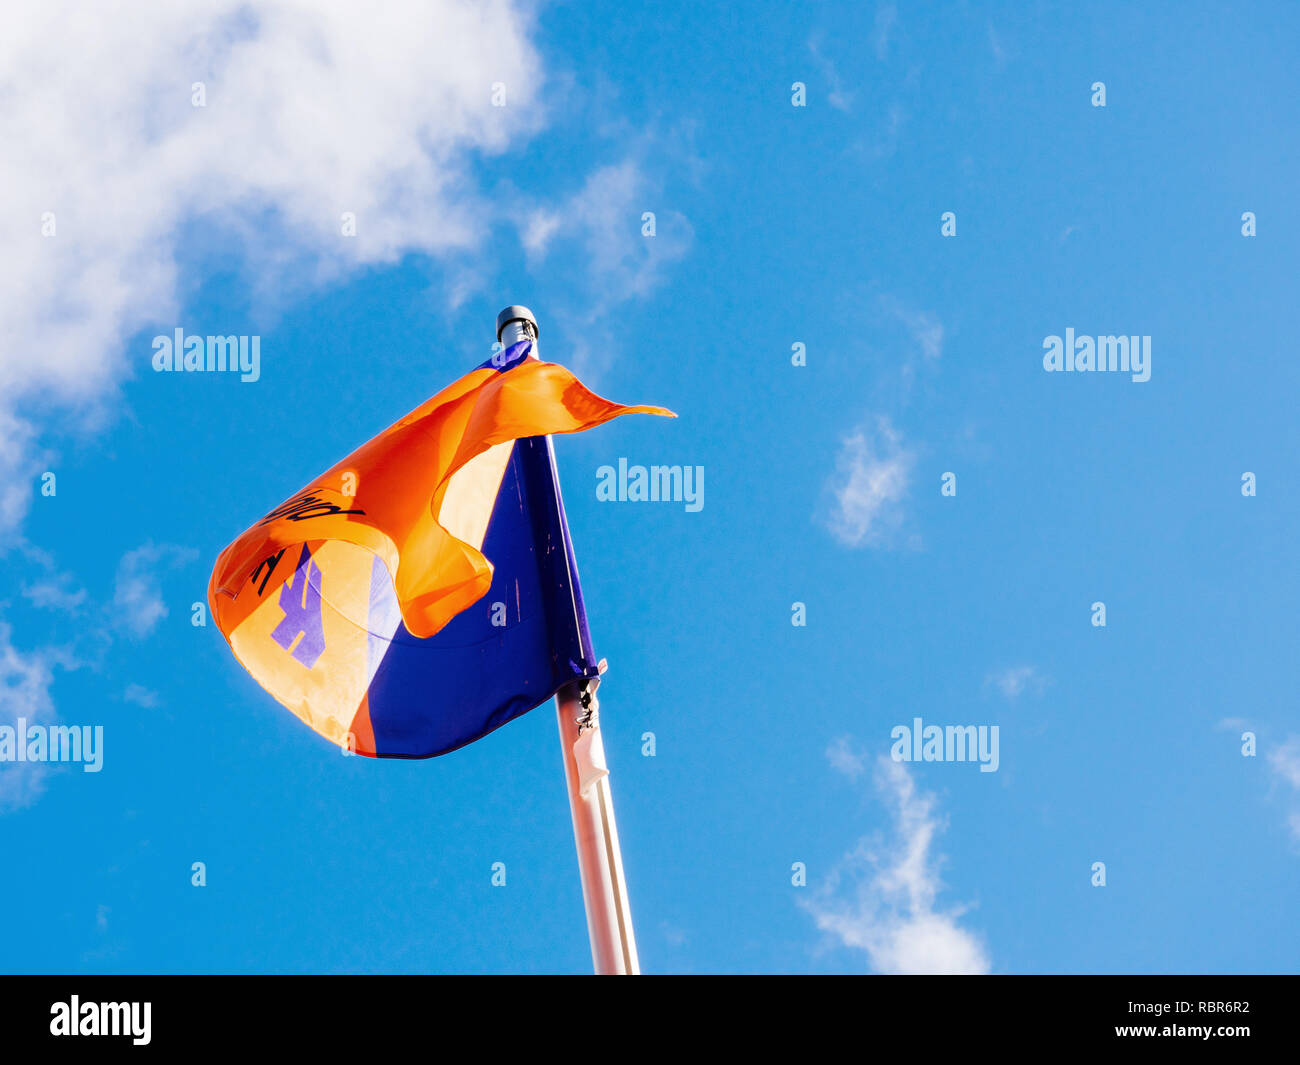 HAMBURG, GERMANY - MAR 20, 2018: Hapag-Low angle view of Lloyd transnational German-based transportation company flag waving against blue sky - Stock Image